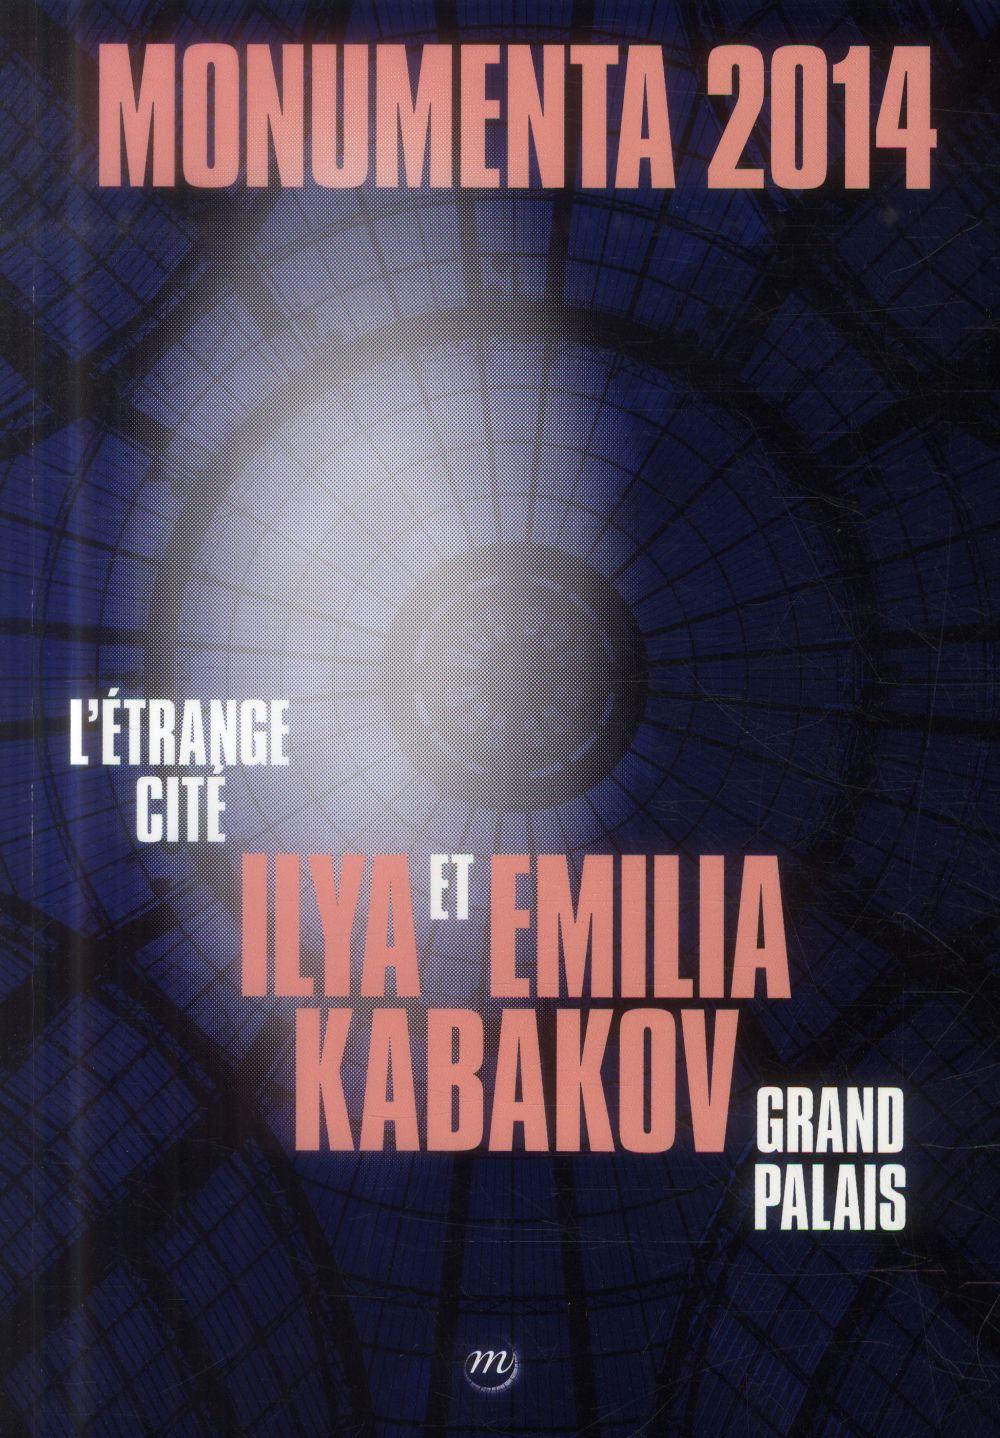 MONUMENTA KABAKOV - ALBUM - ANG/FR/RUSSE